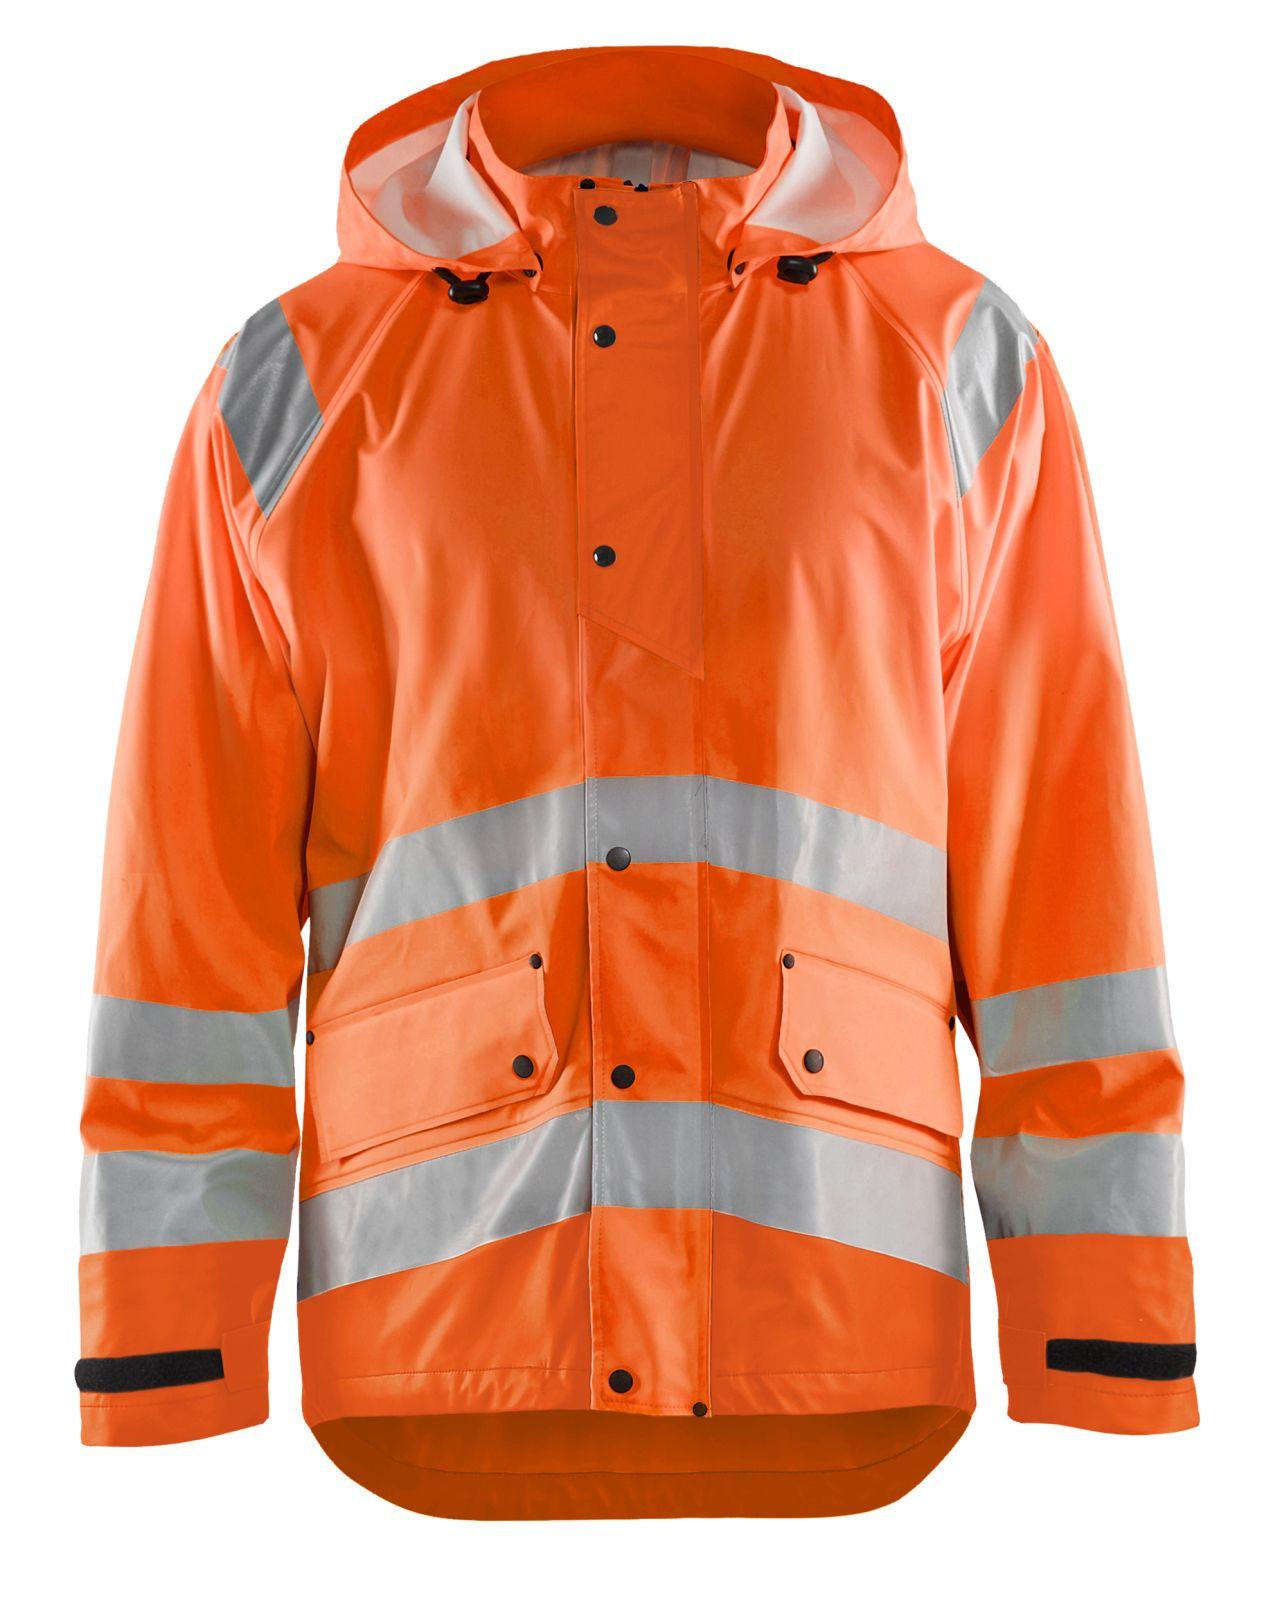 Blaklader Regenjassen 43232000 High Vis fluo-oranje(5300)